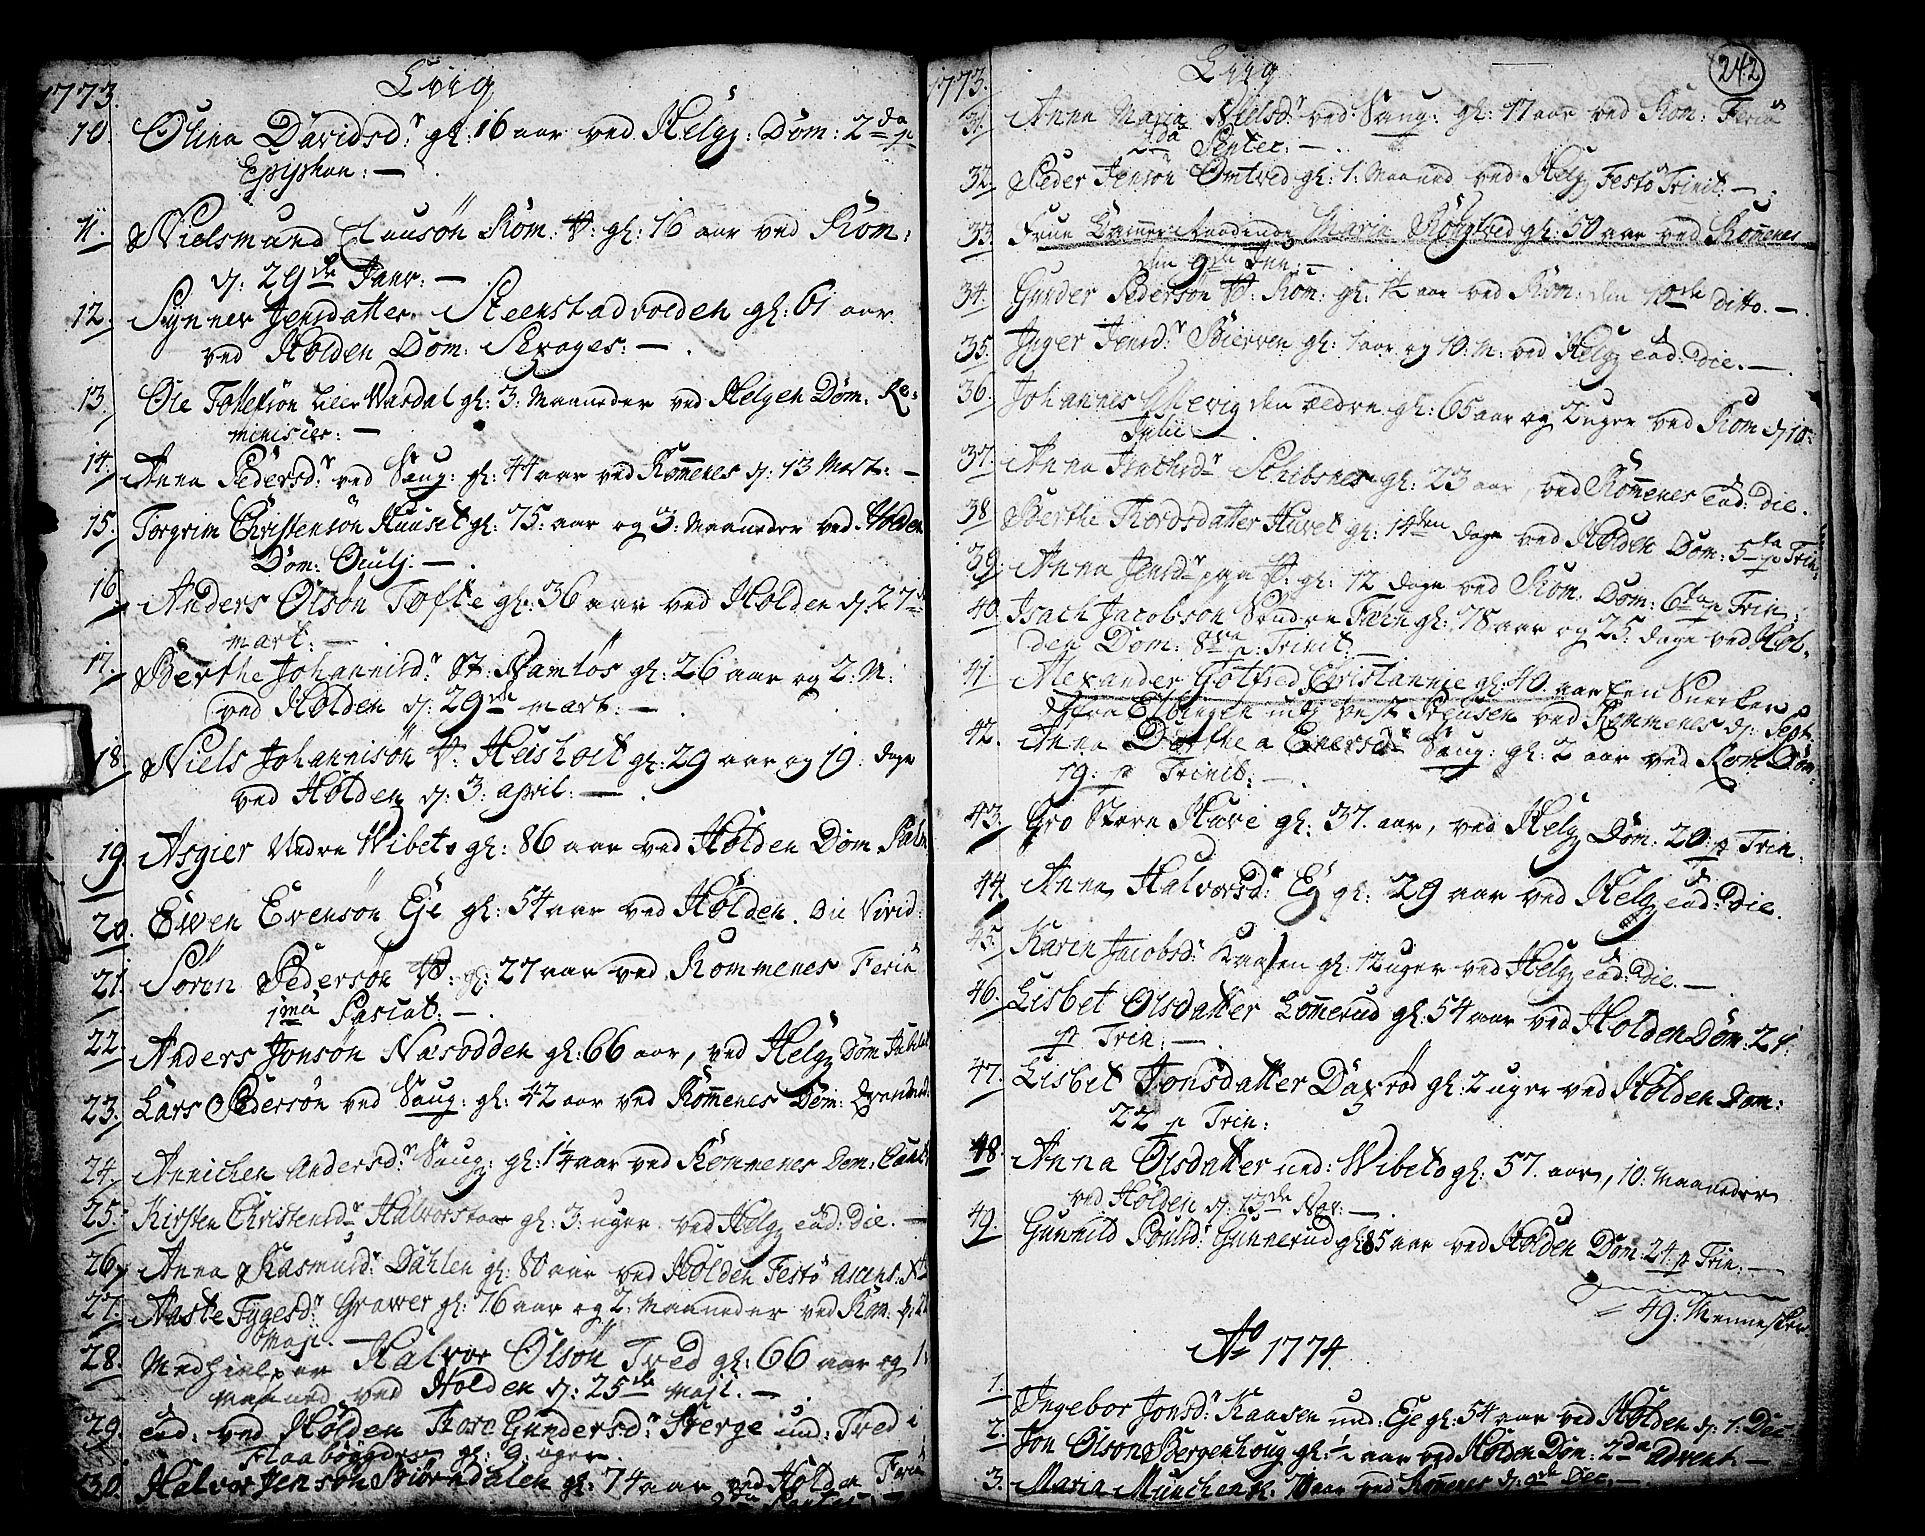 SAKO, Holla kirkebøker, F/Fa/L0001: Ministerialbok nr. 1, 1717-1779, s. 242